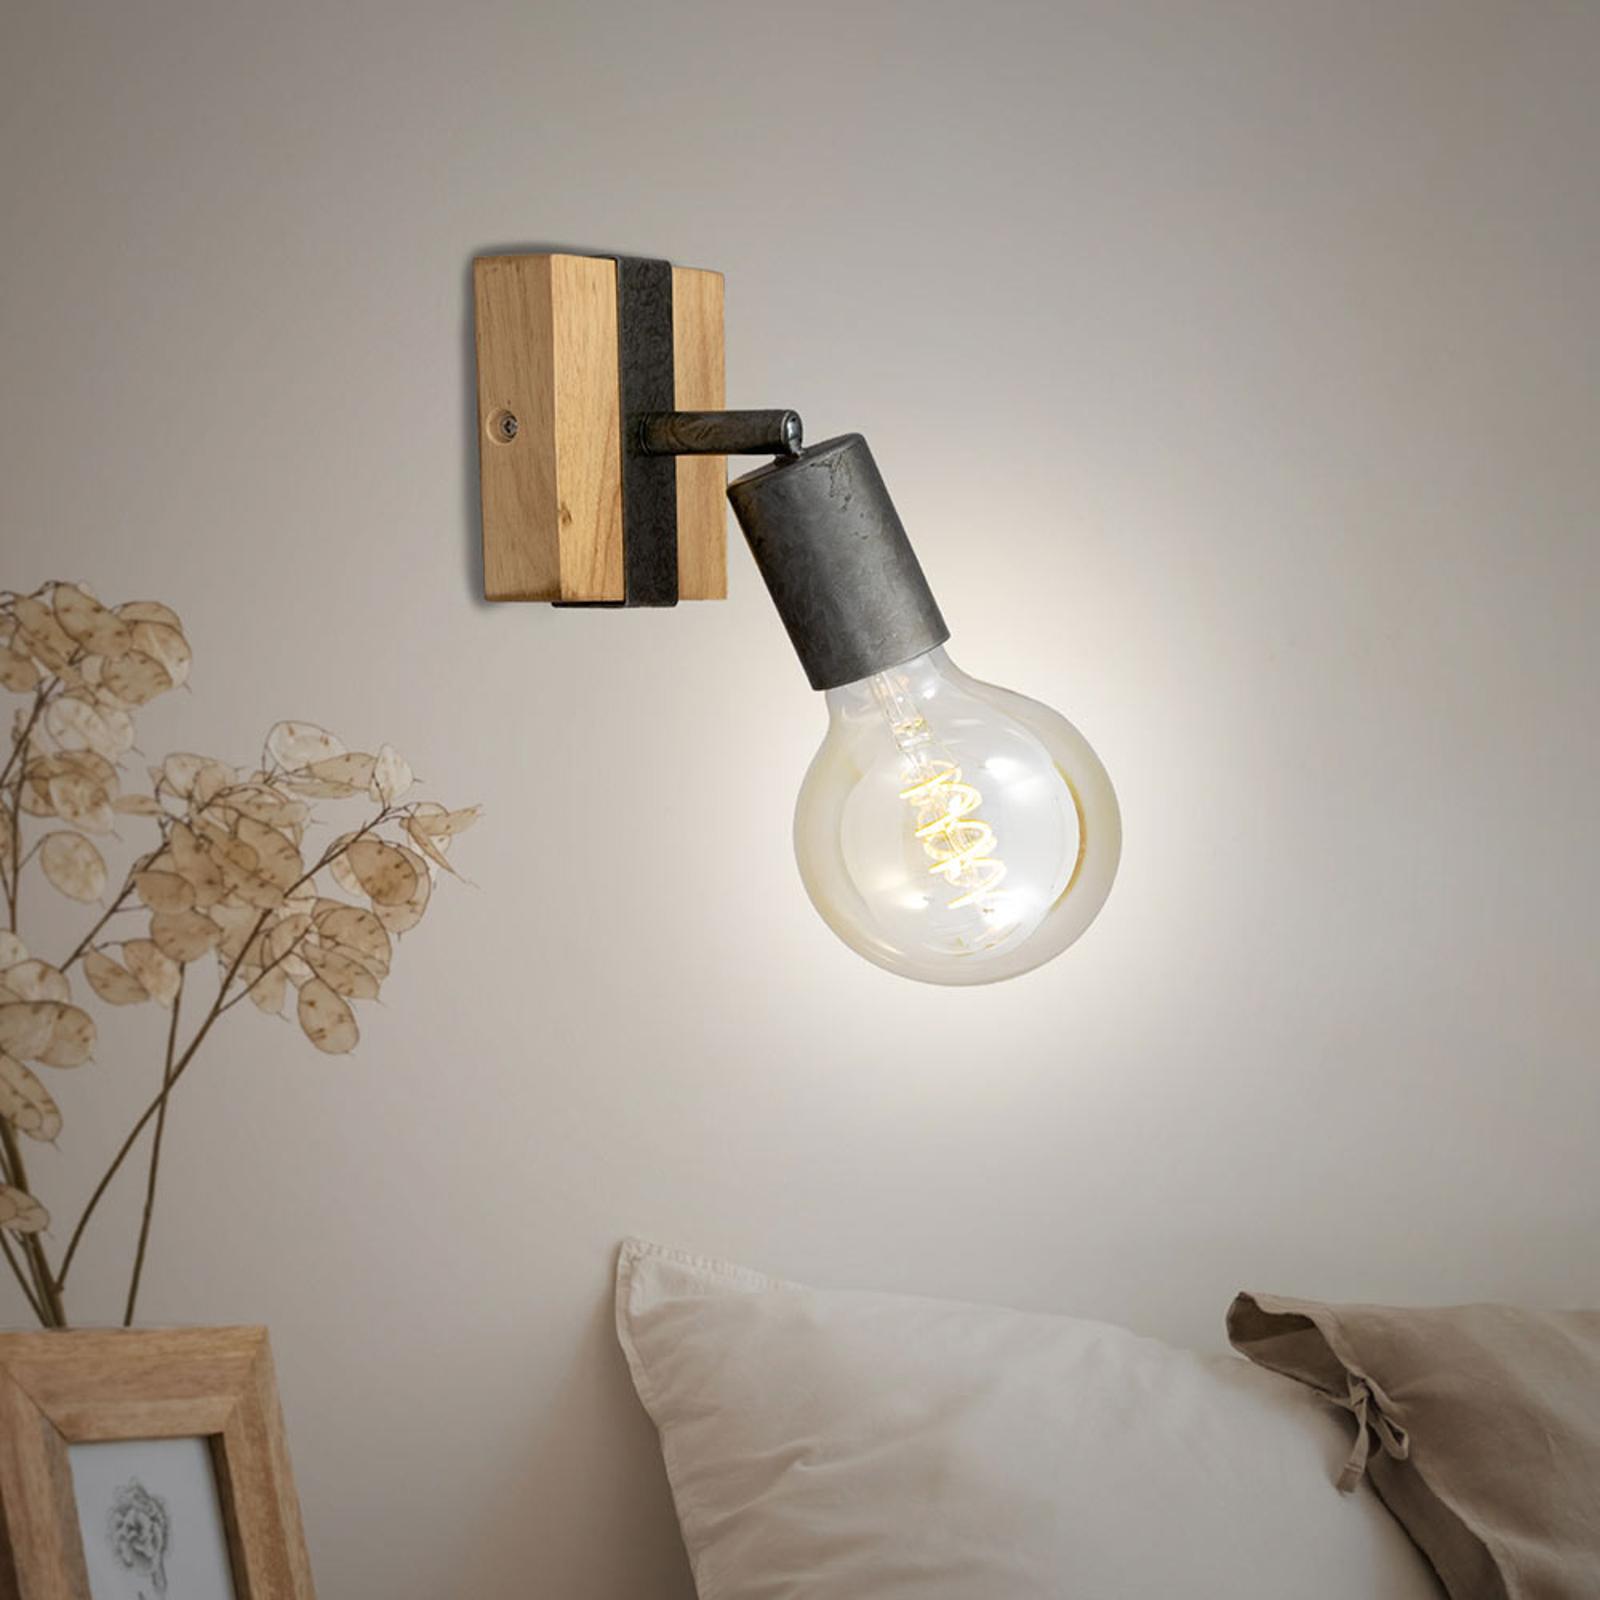 Vegglampe Wood Basic, 1 lyskilde